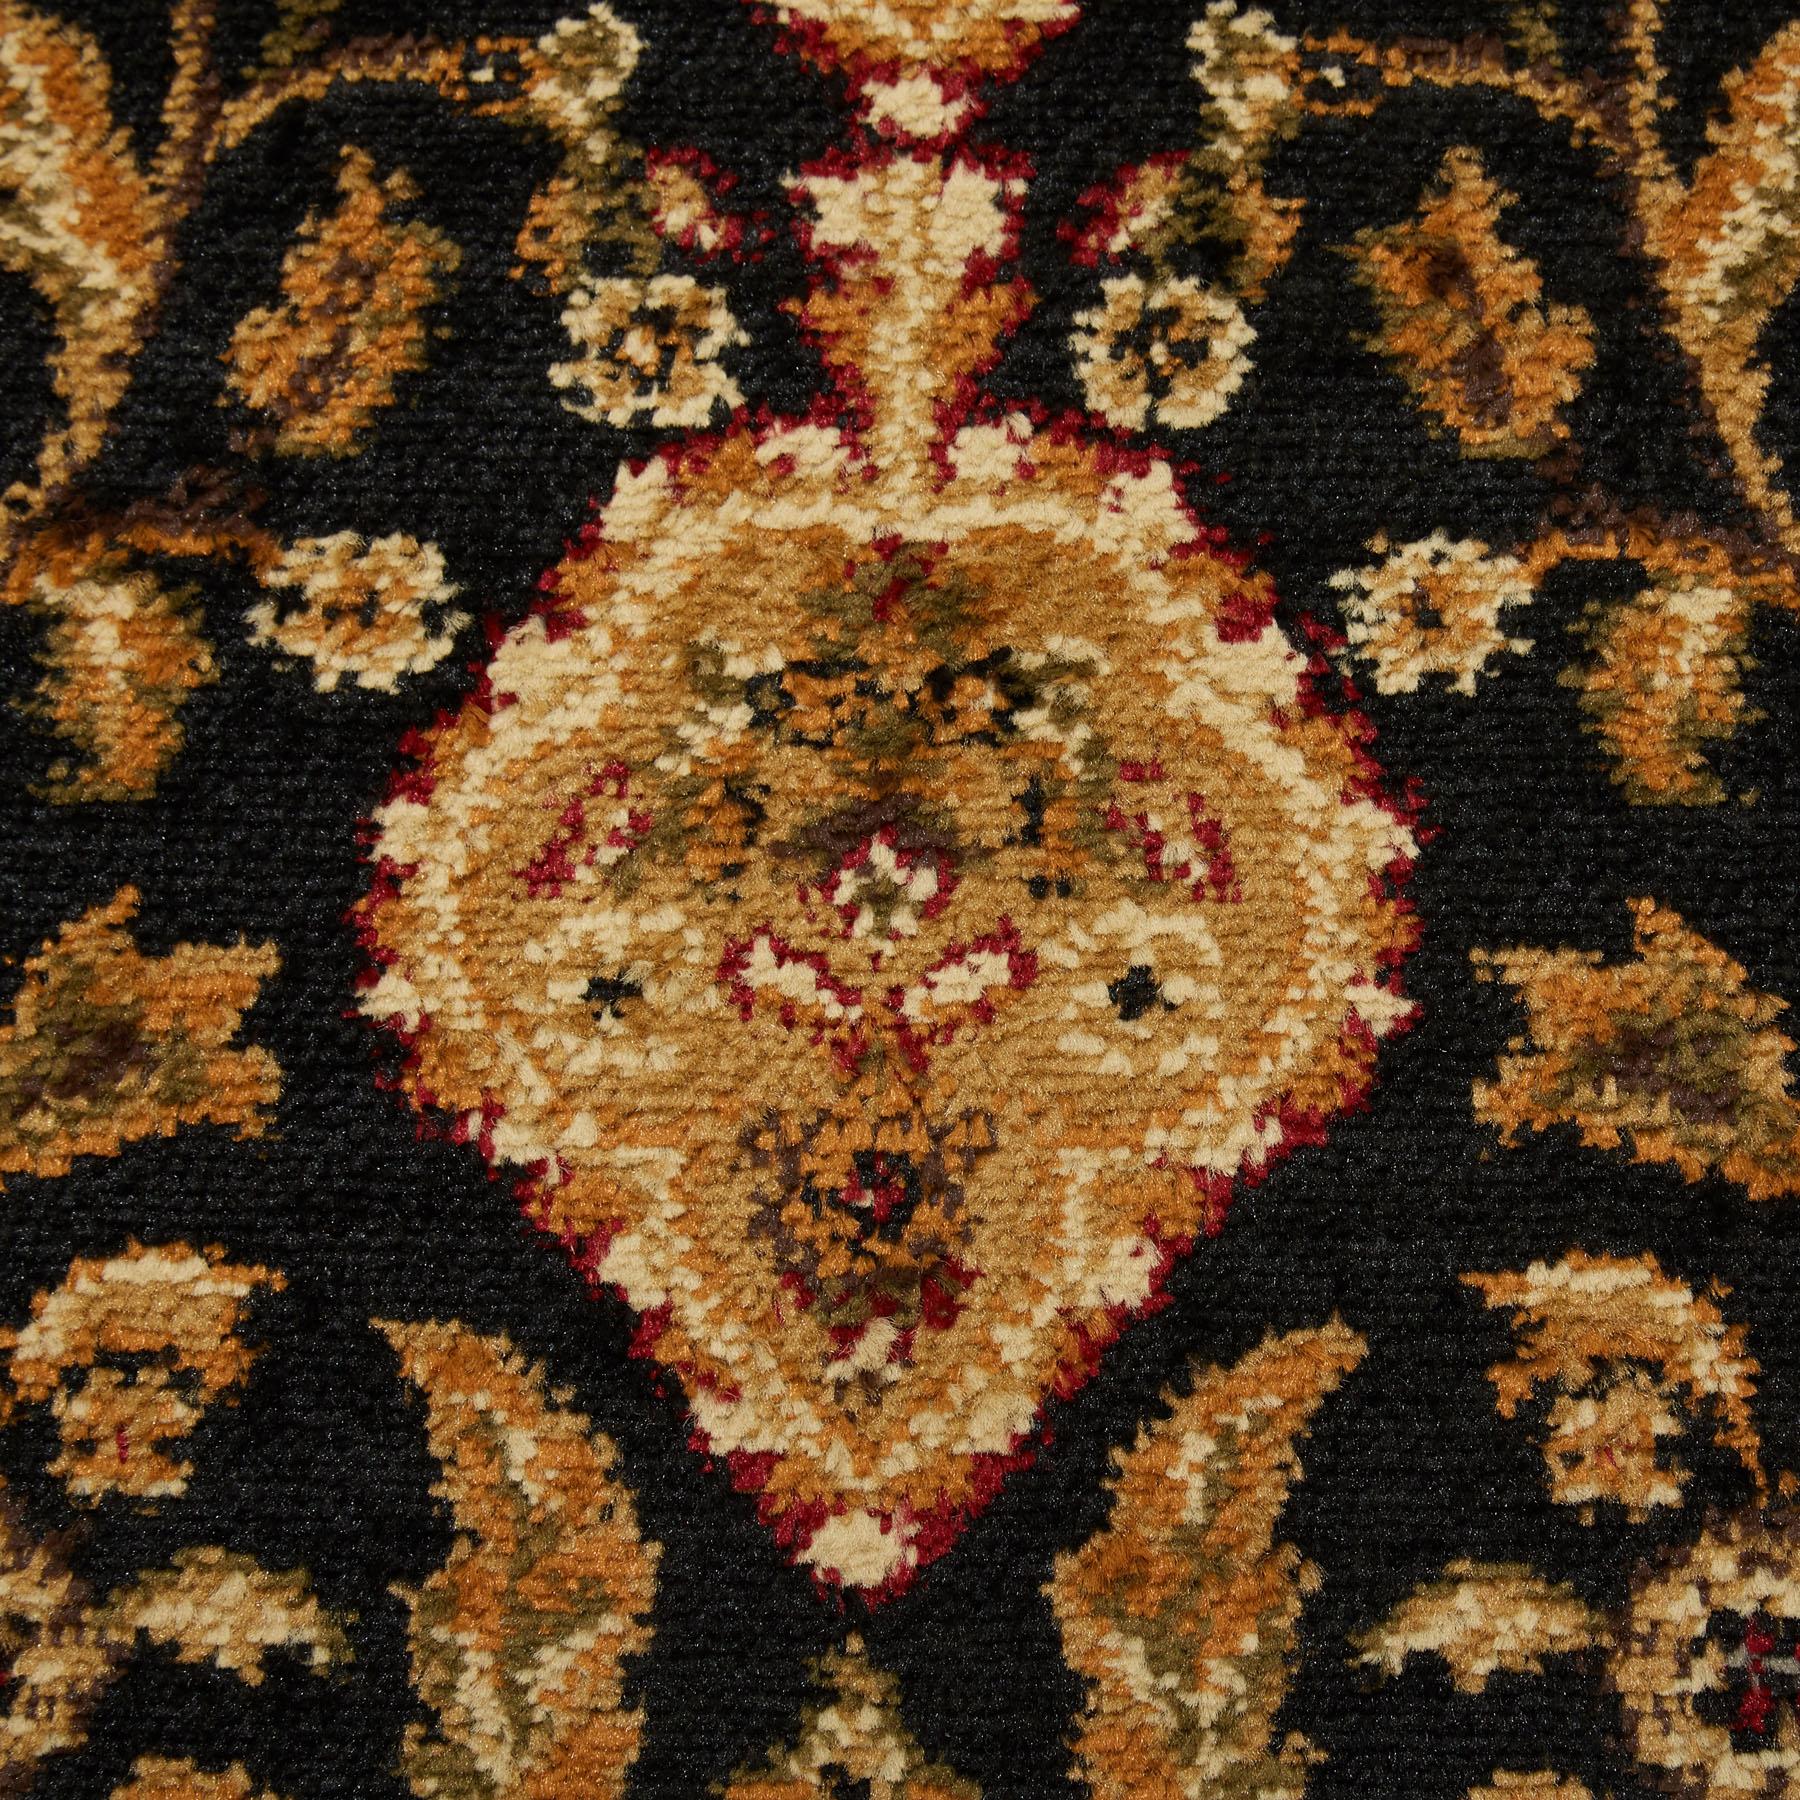 Black Oriental Area Rug 4X6 Small Persian Carpet 83